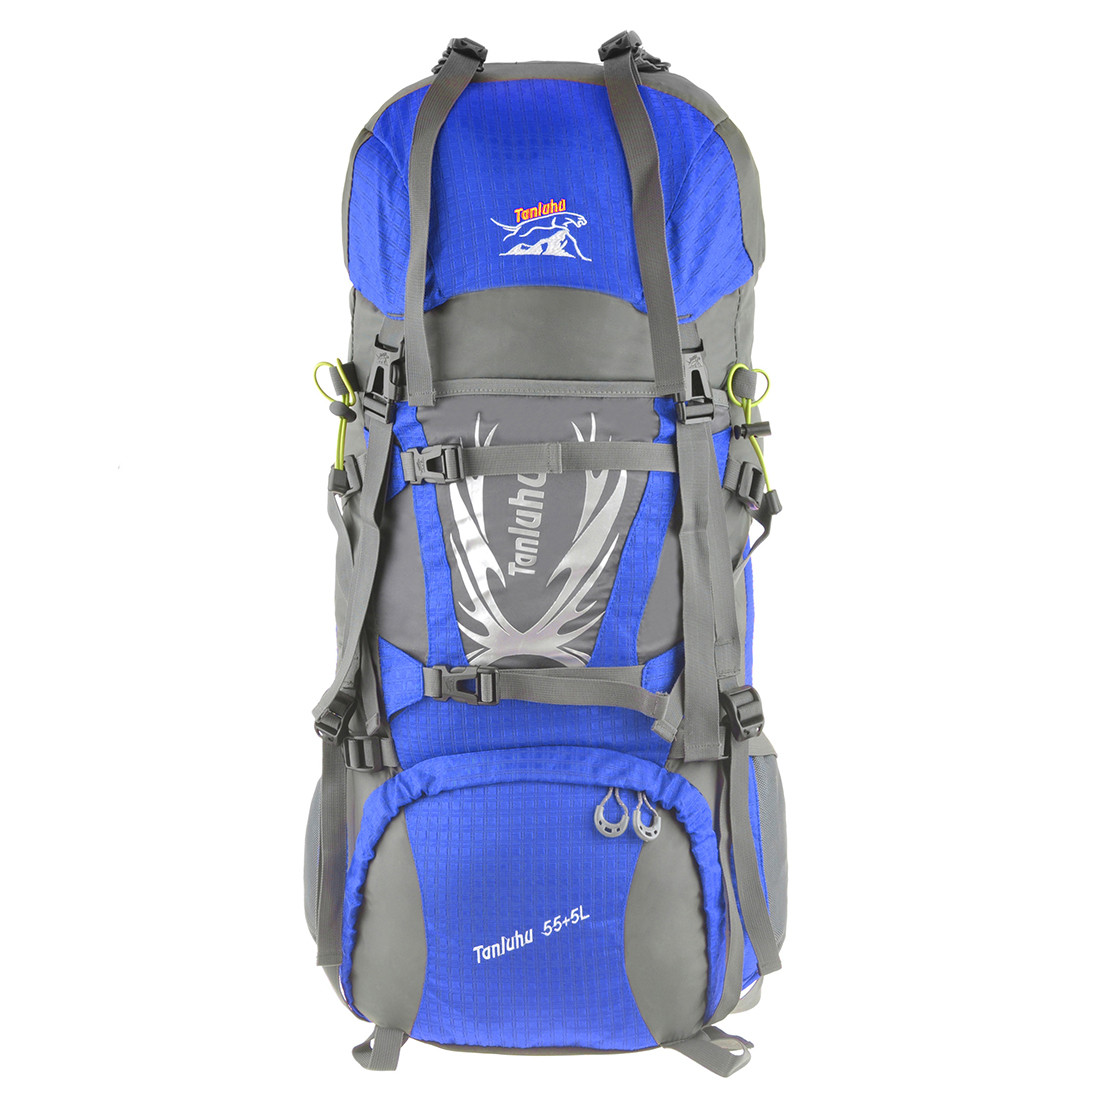 Рюкзак туристический TANLUHU 80х32х24 55+5л голубой Polyester Oxford Rip Stop PU 600D/1600D кс627гол